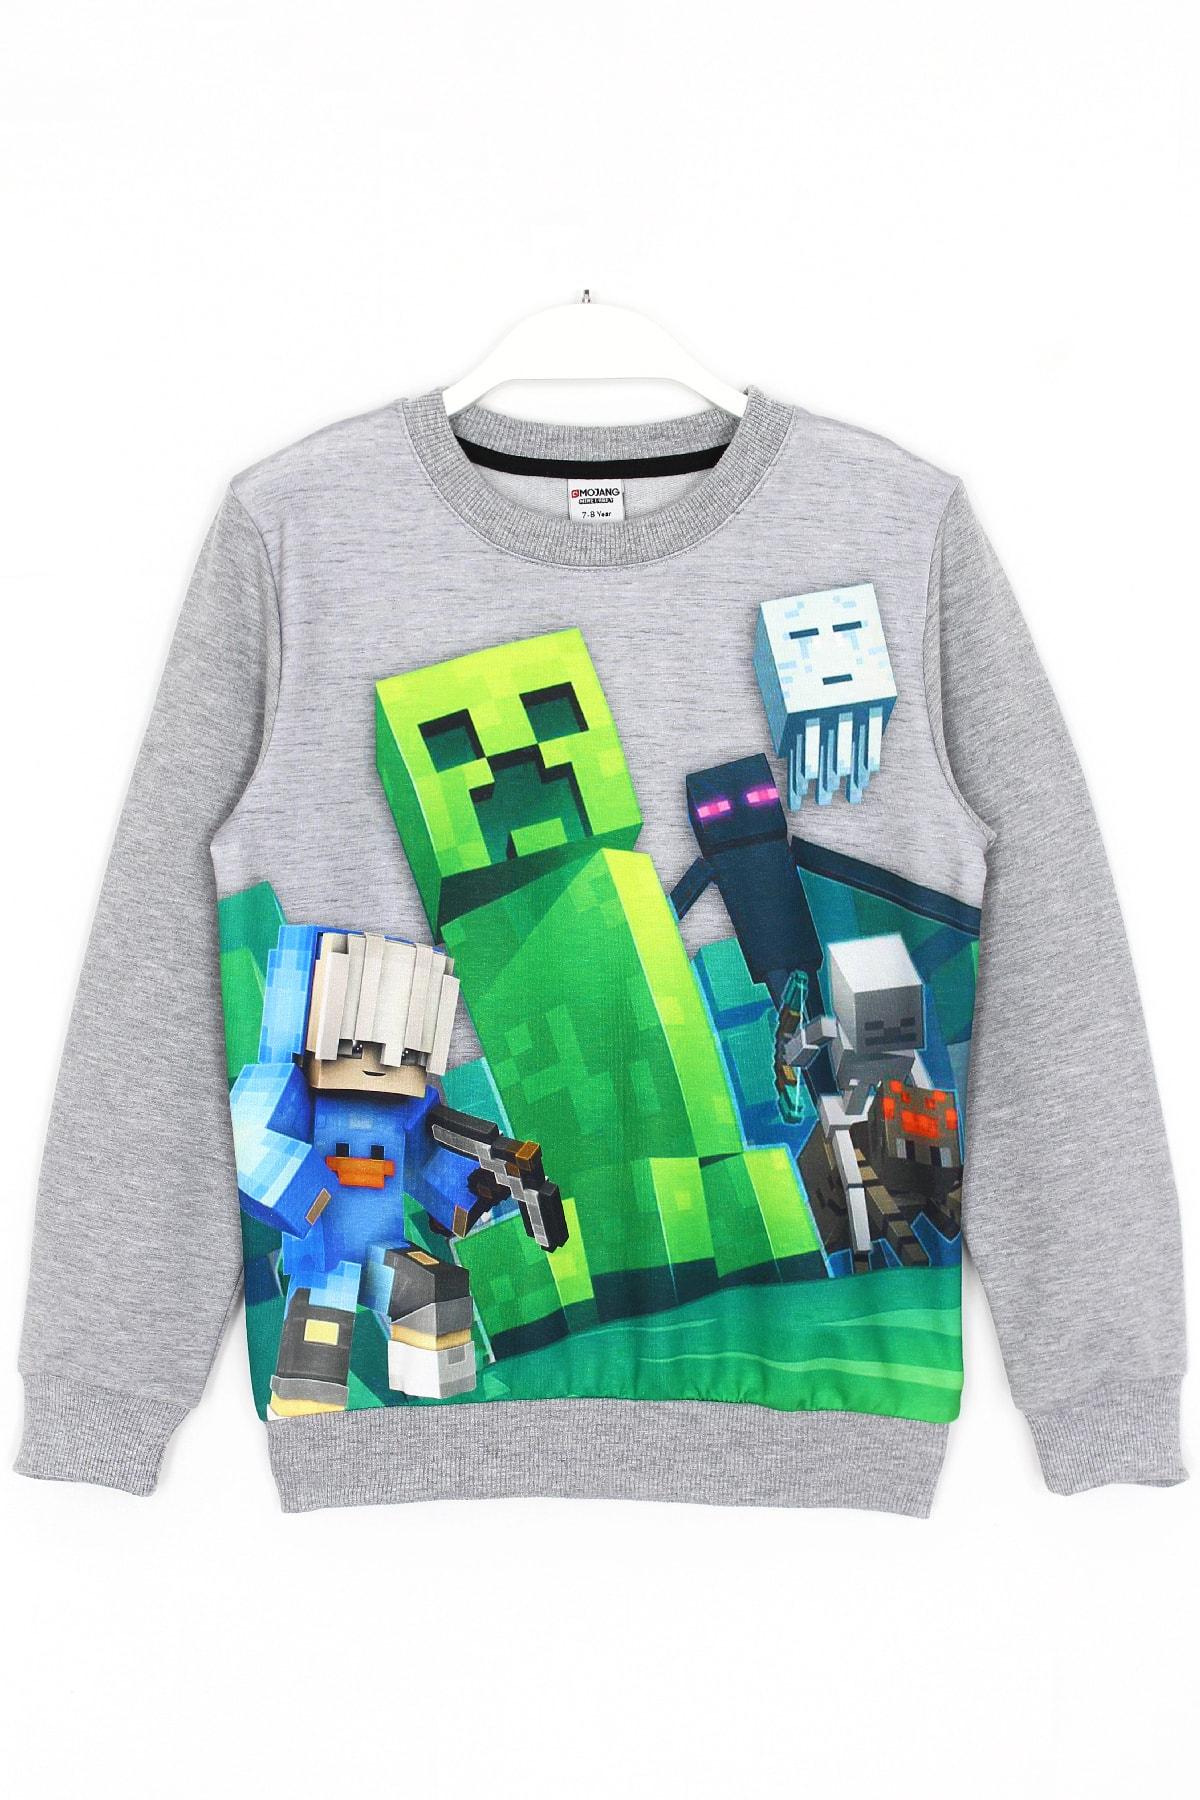 Çocuk Gri Minecraft Creeper Baskılı Sweatshirt 5 - 14 Yaş